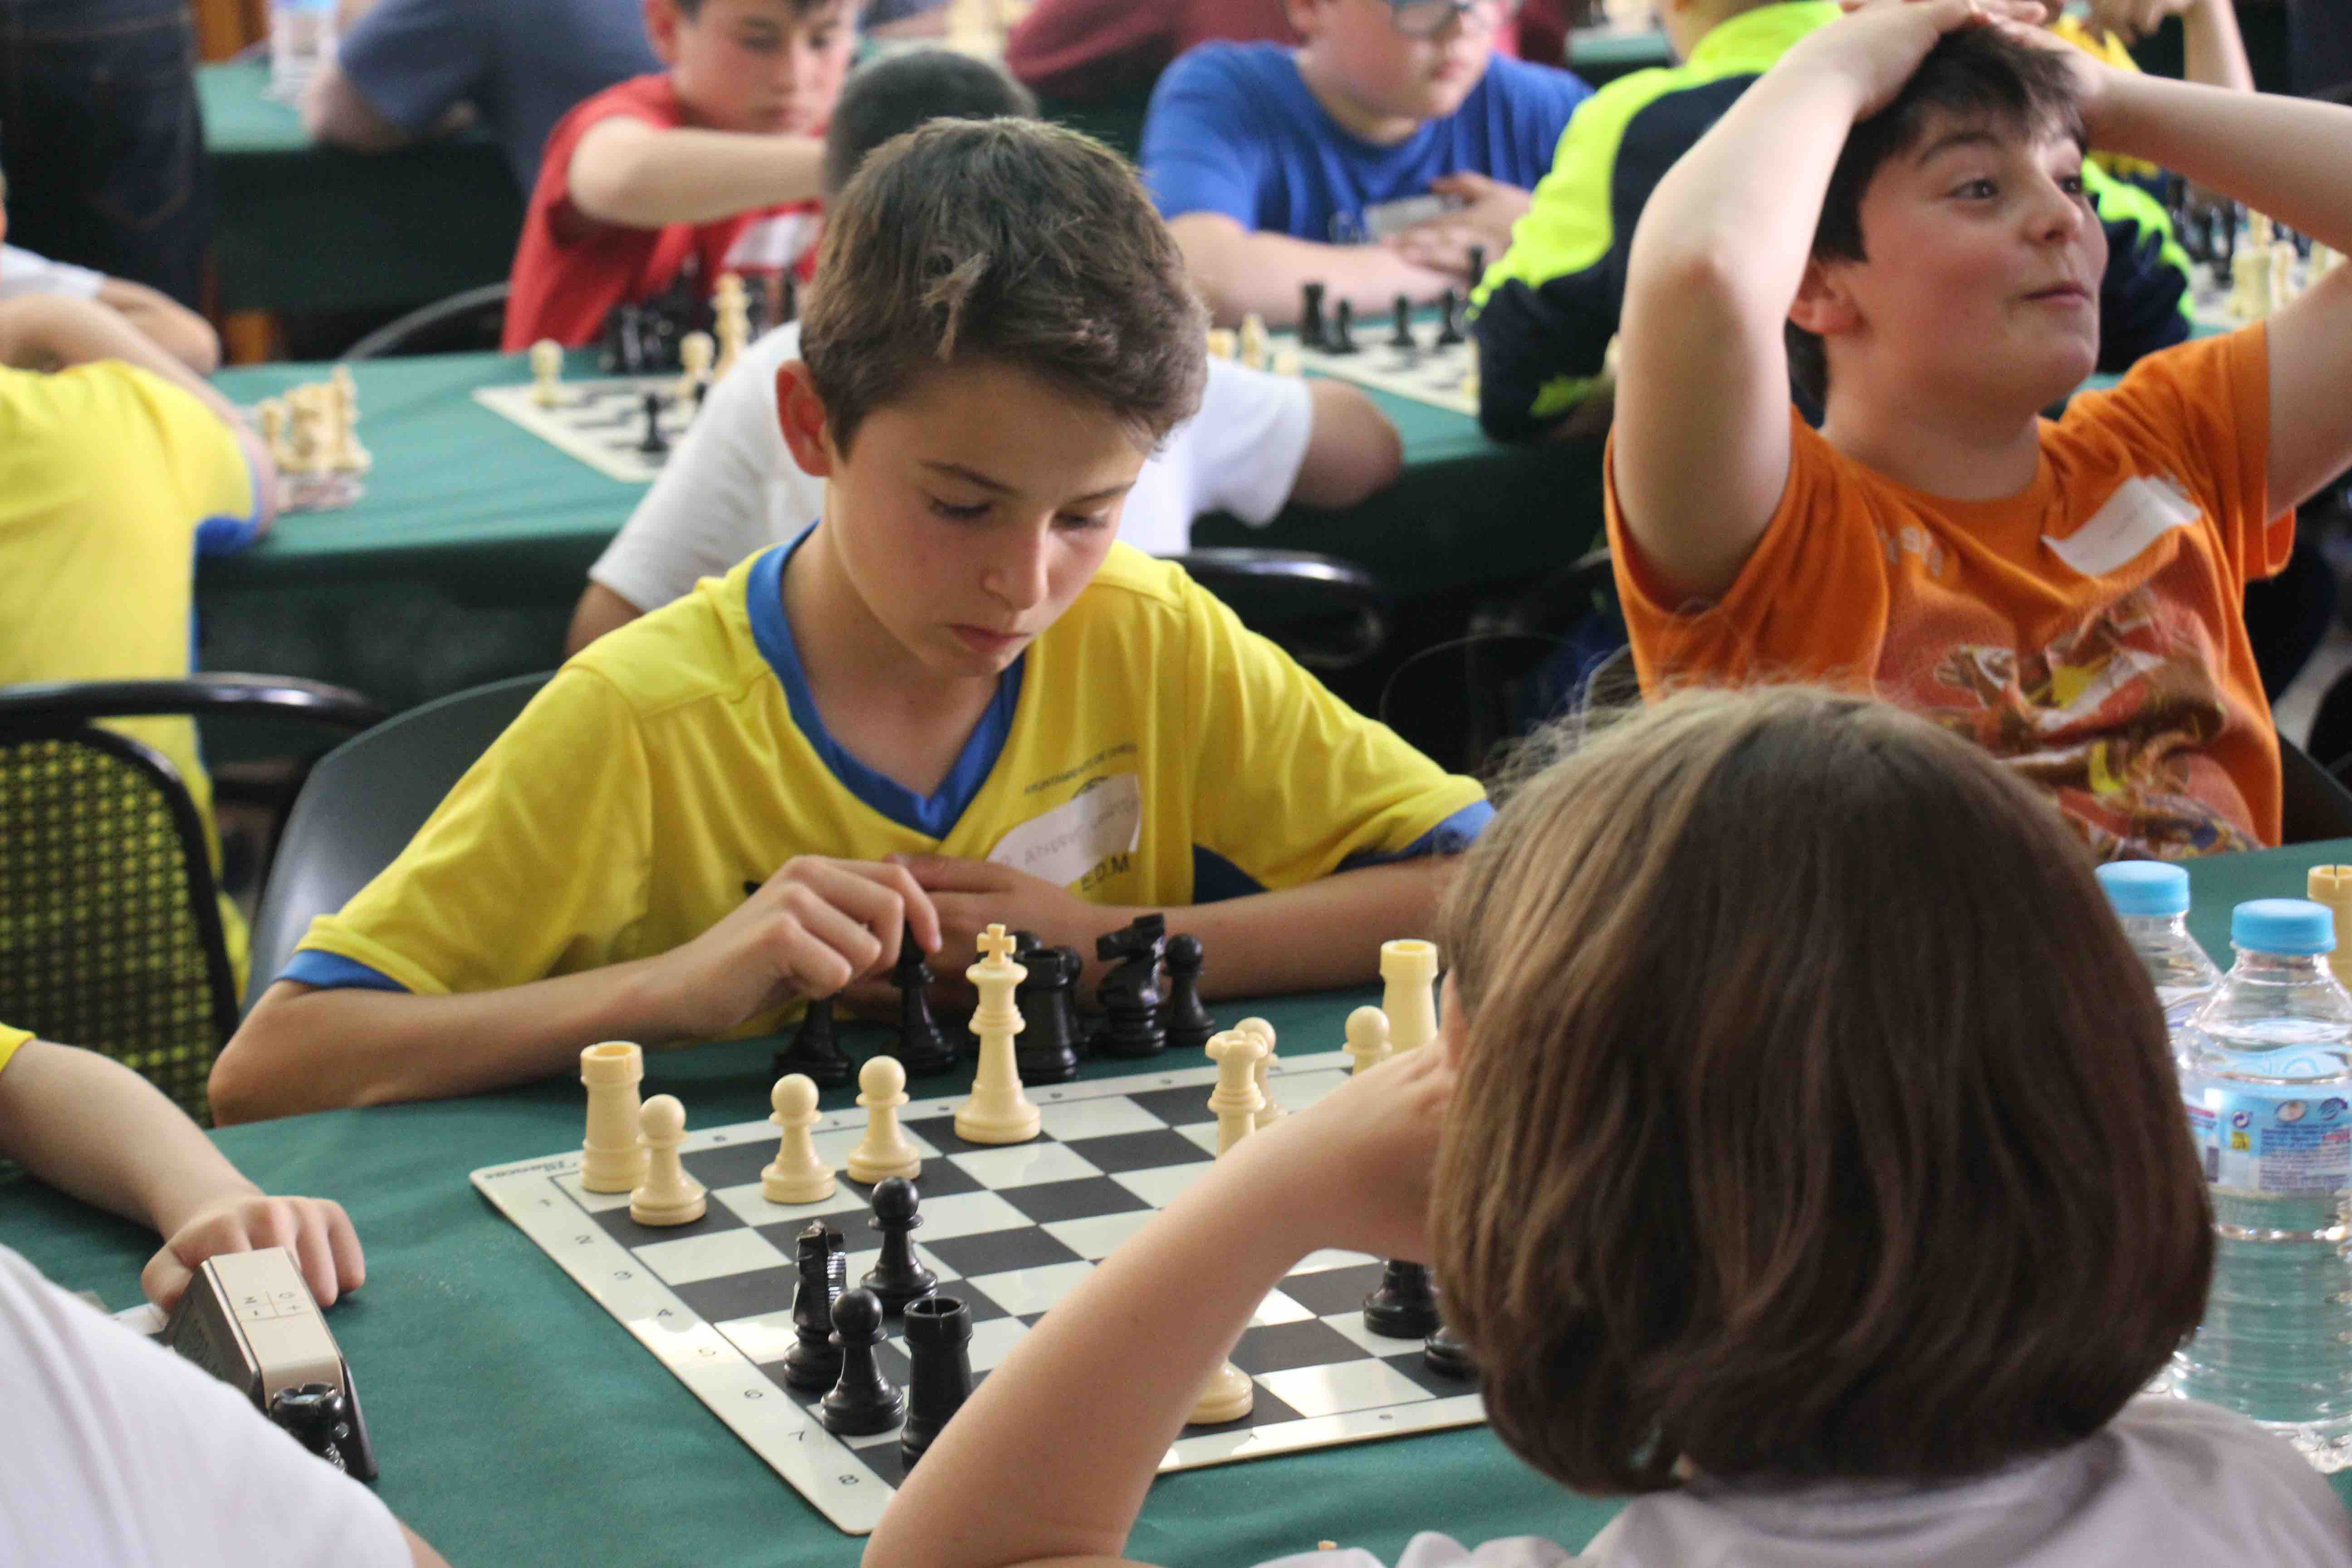 VII Torneo Ajedrez de Cheste.